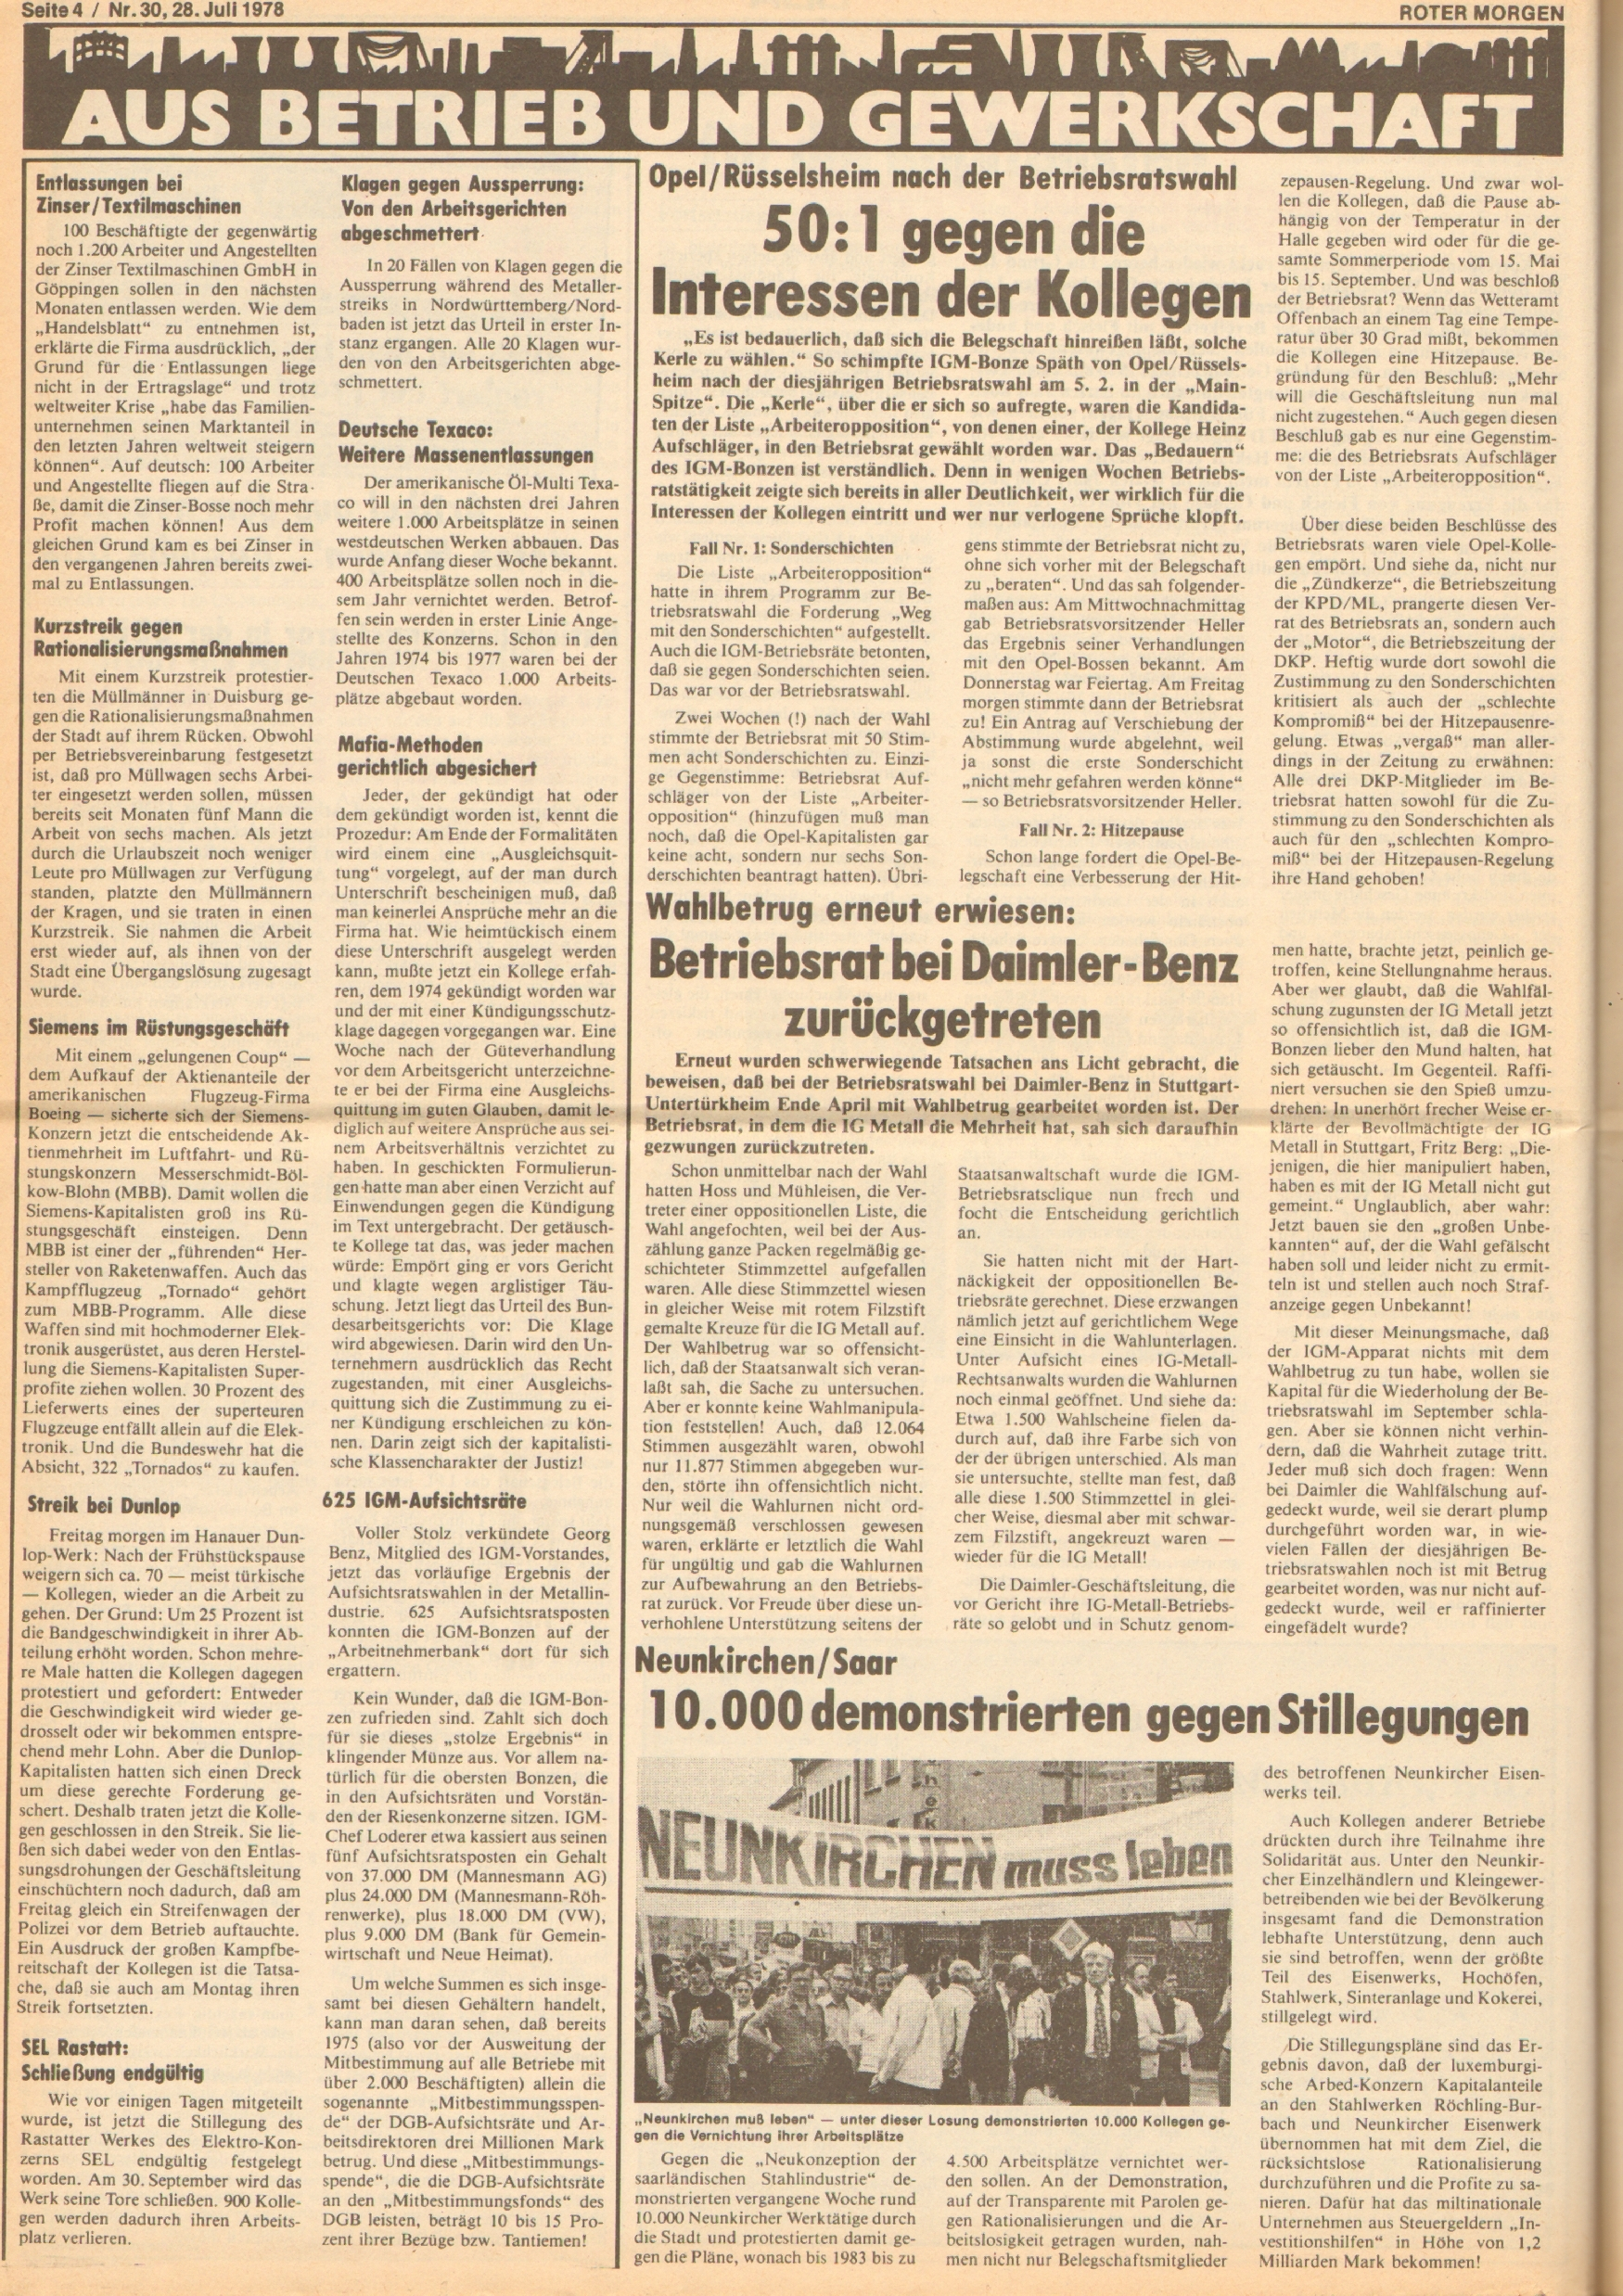 Roter Morgen, 12. Jg., 28. Juli 1978, Nr. 30, Seite 4